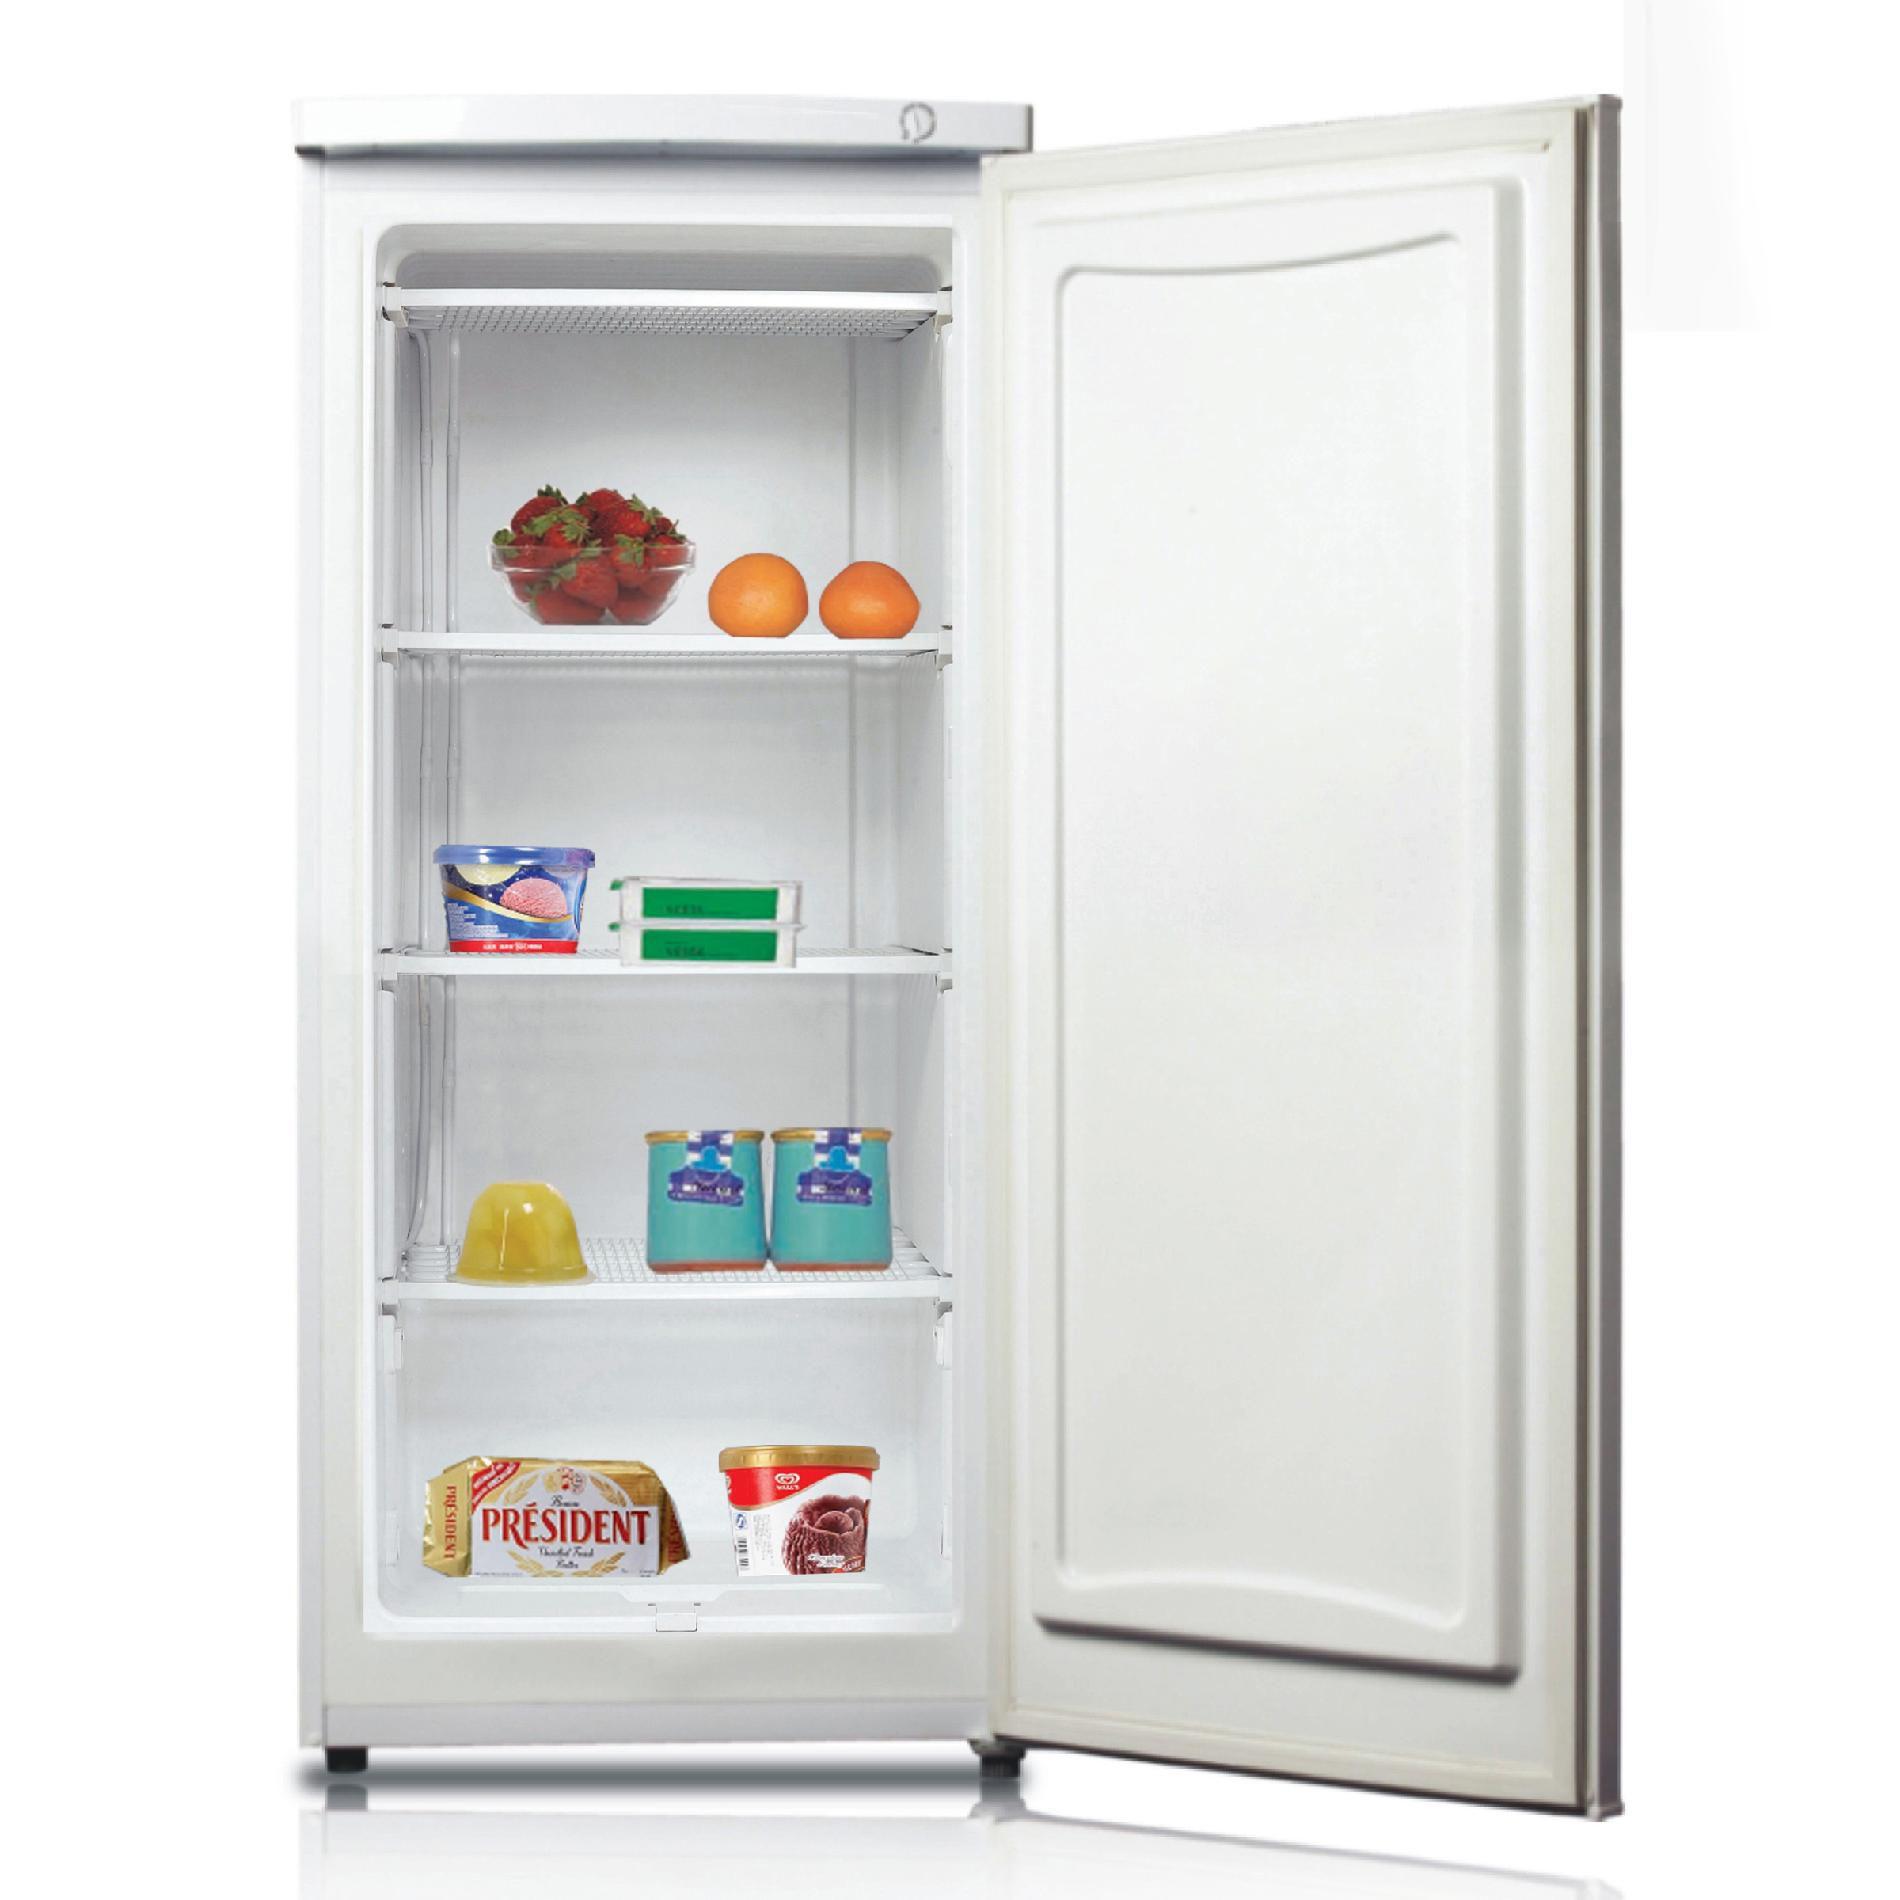 Kenmore 5.1 cu. ft. Upright Freezer